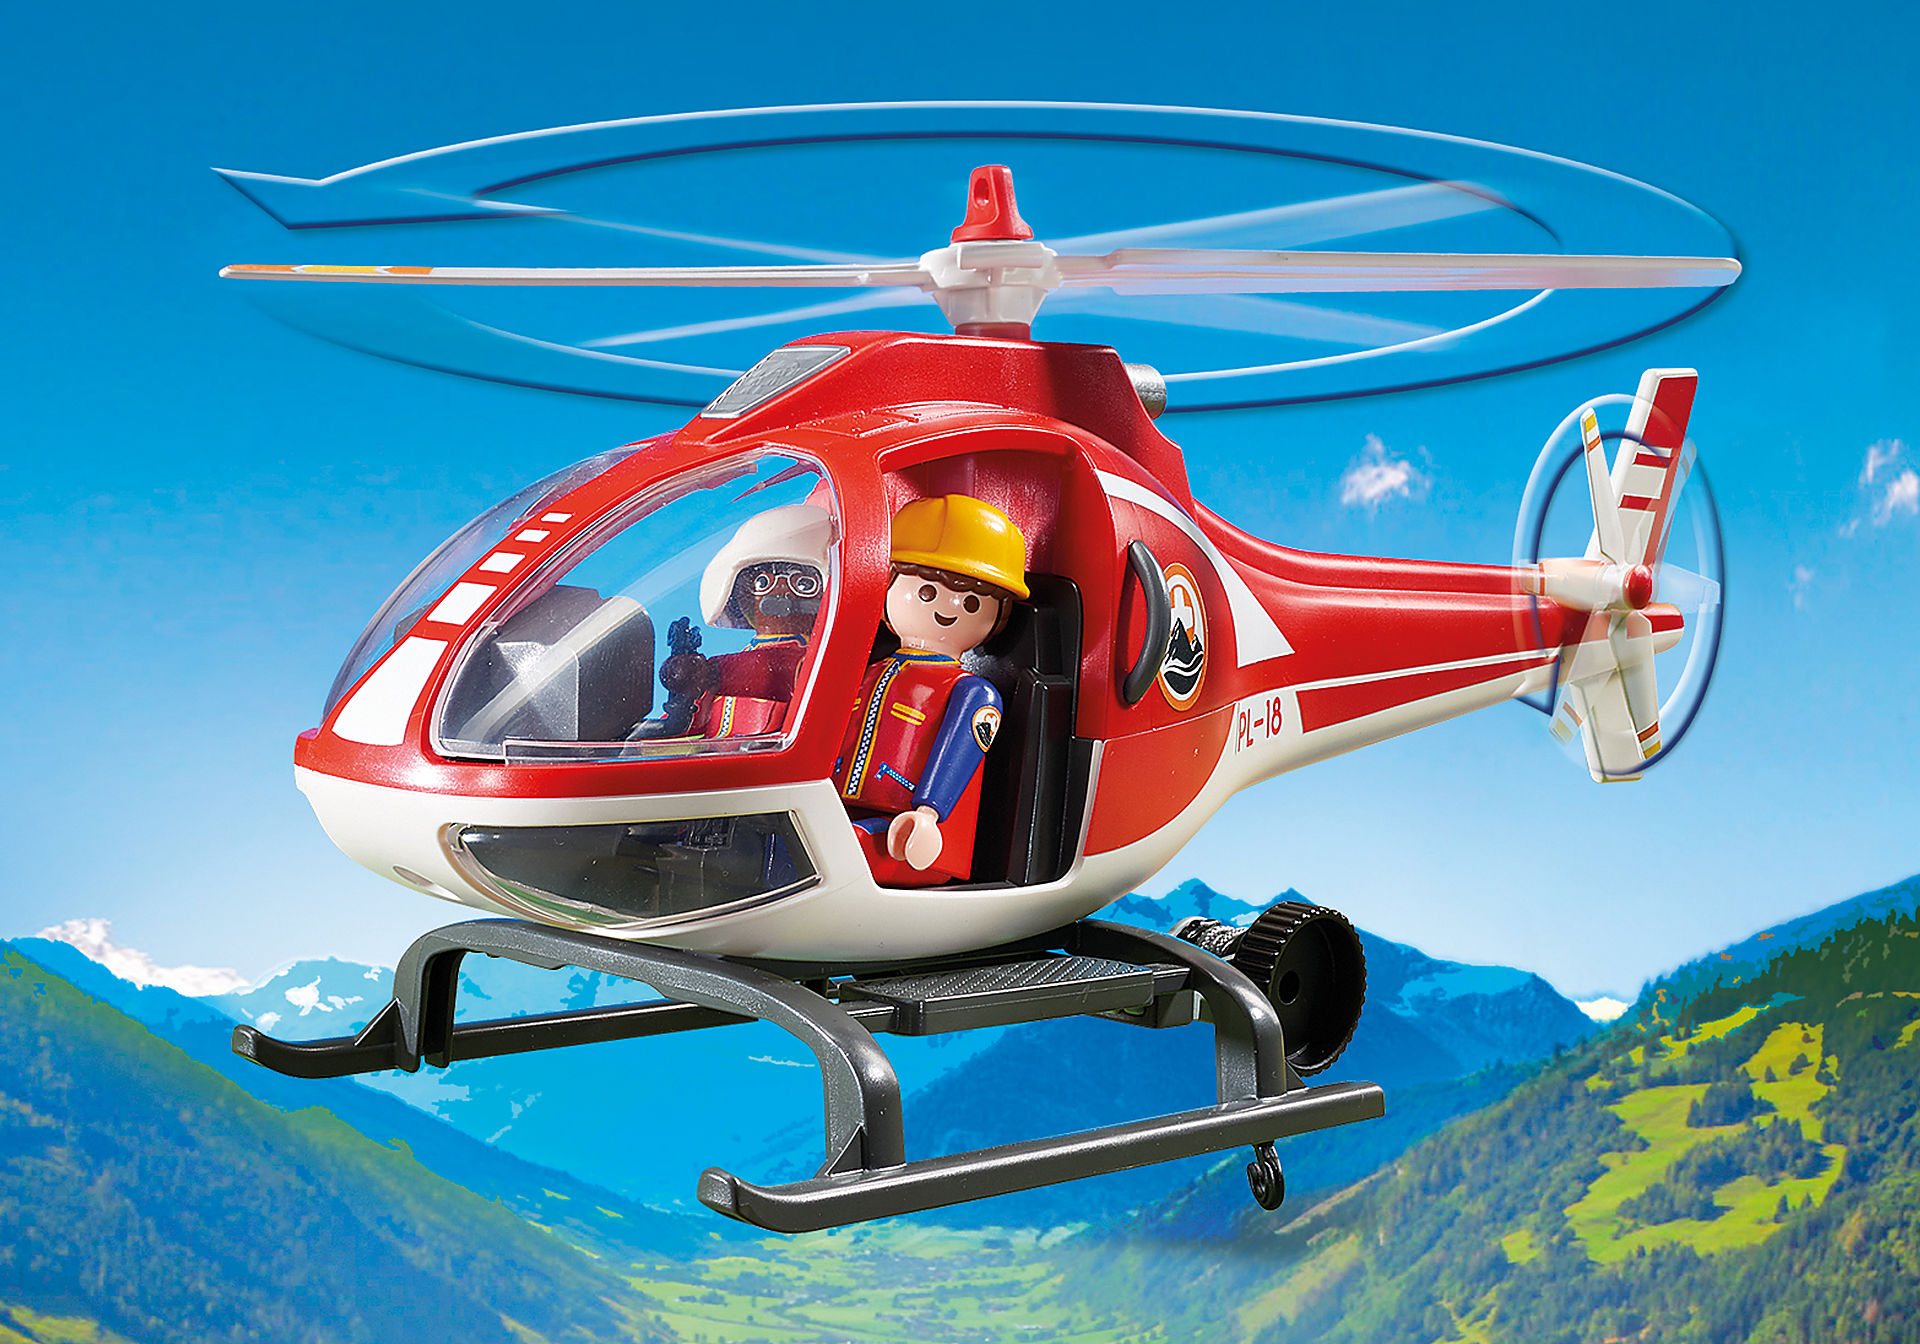 9127 Elicottero soccorso alpino zoom image6